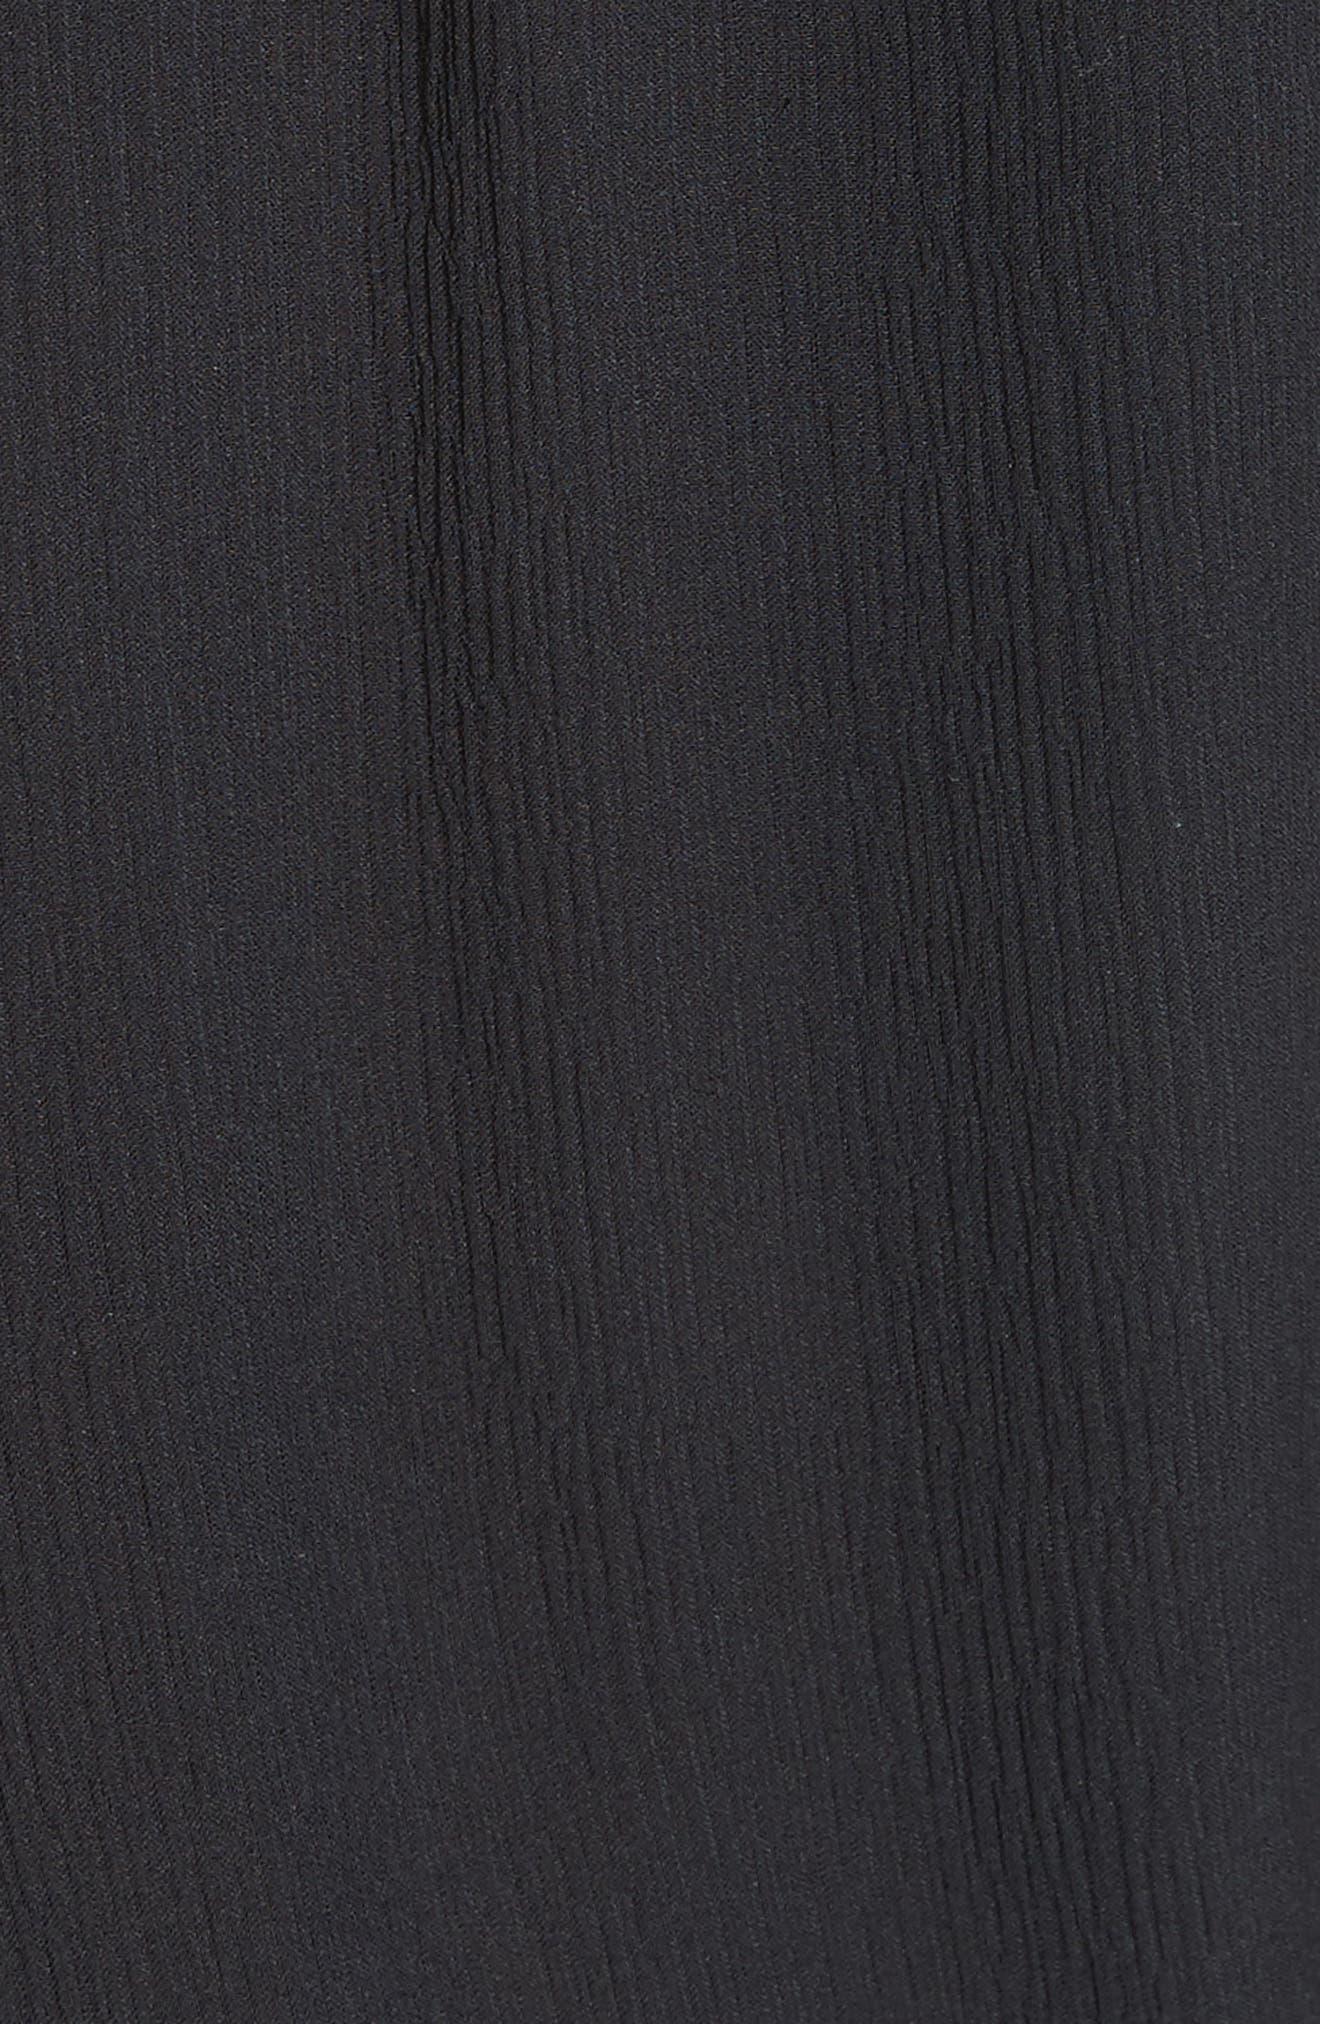 Geromine Blouson Silk Dress,                             Alternate thumbnail 5, color,                             Caviar